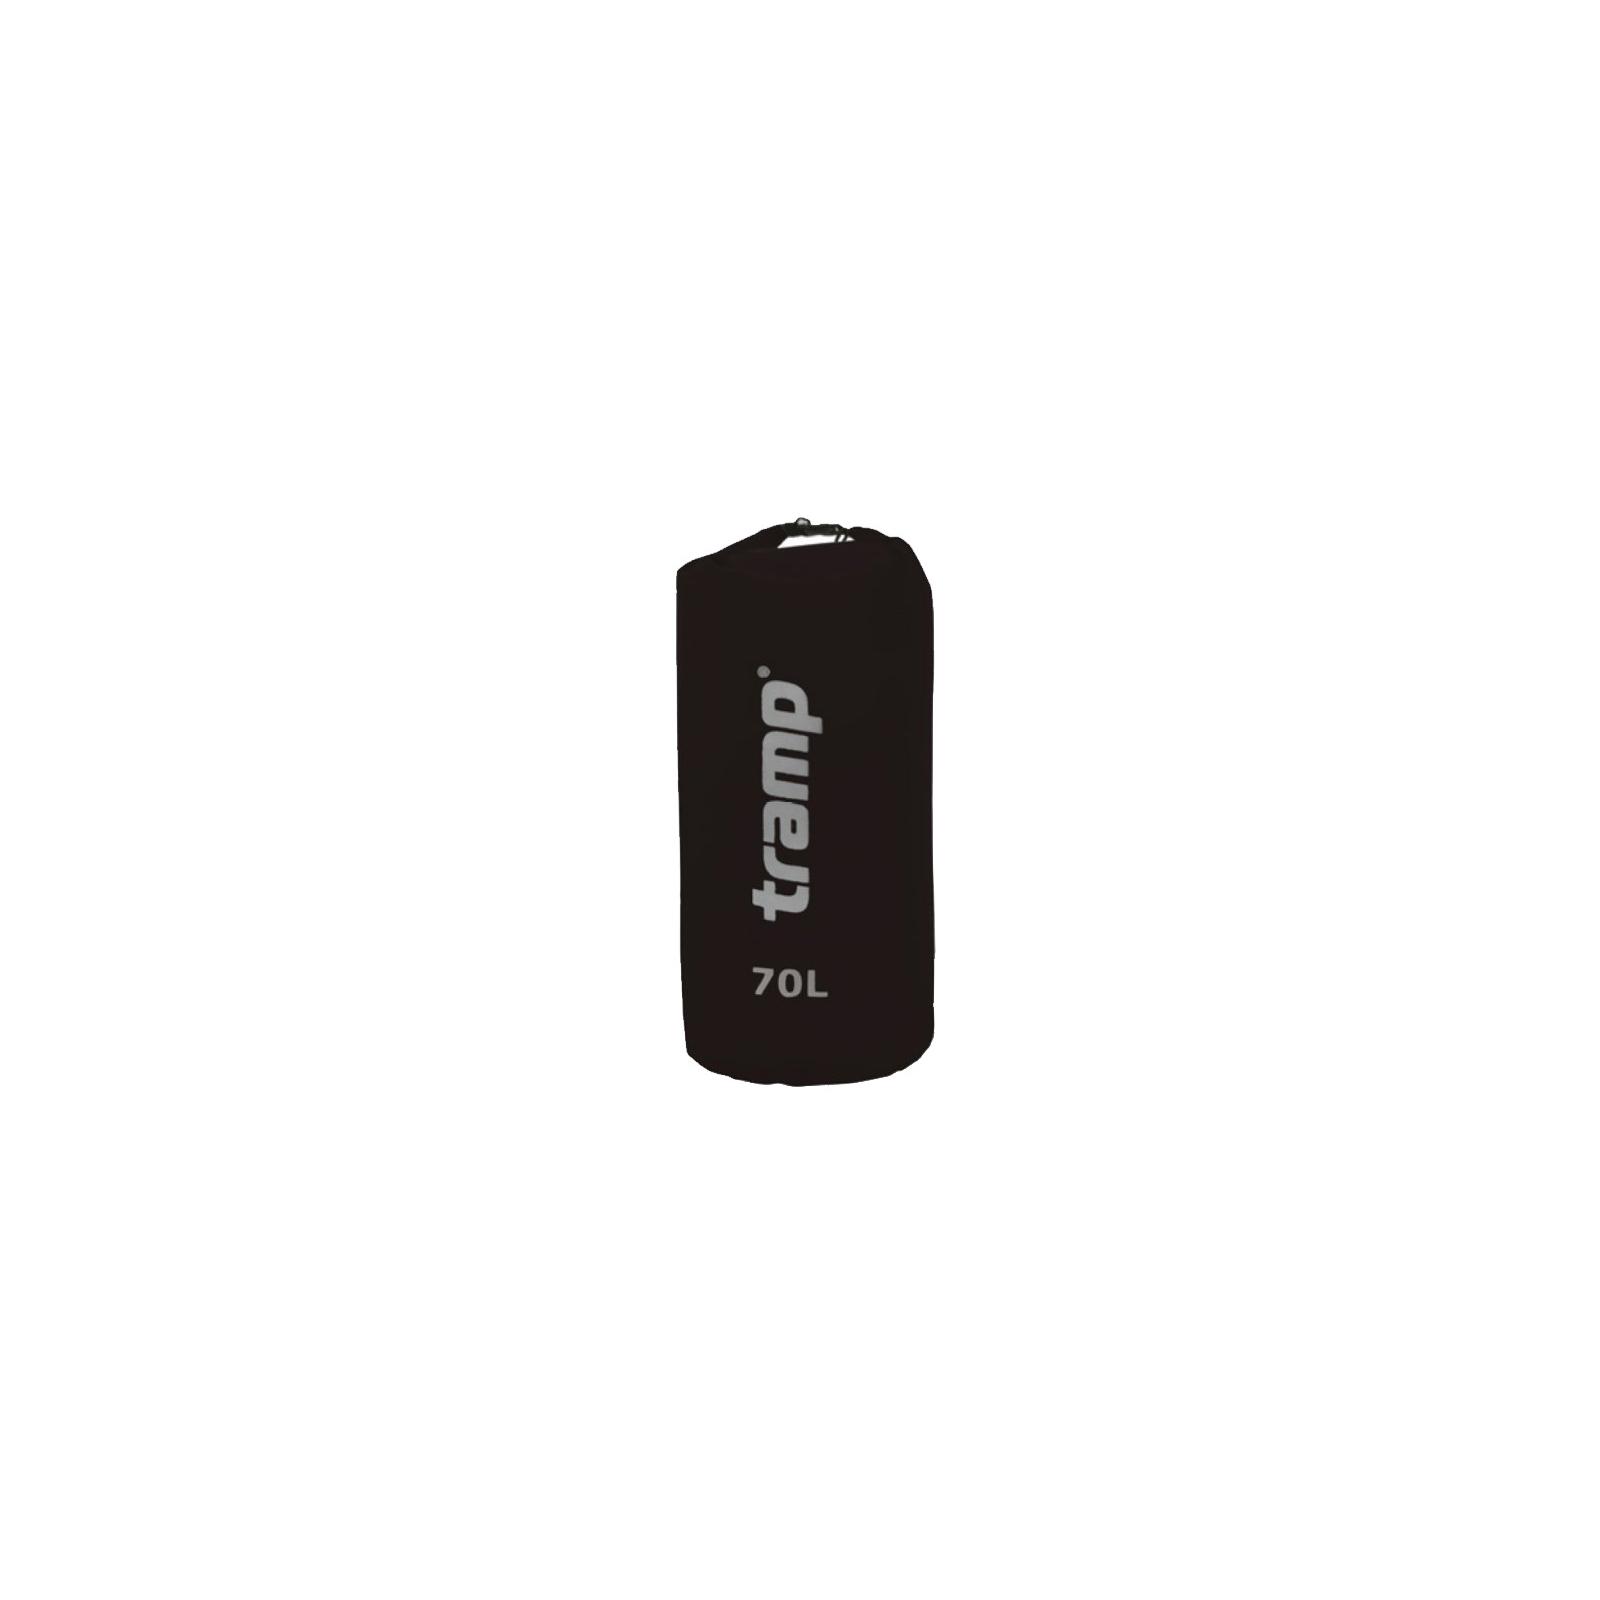 Гермомешок Tramp Nylon PVC 70 черный (TRA-104 black)